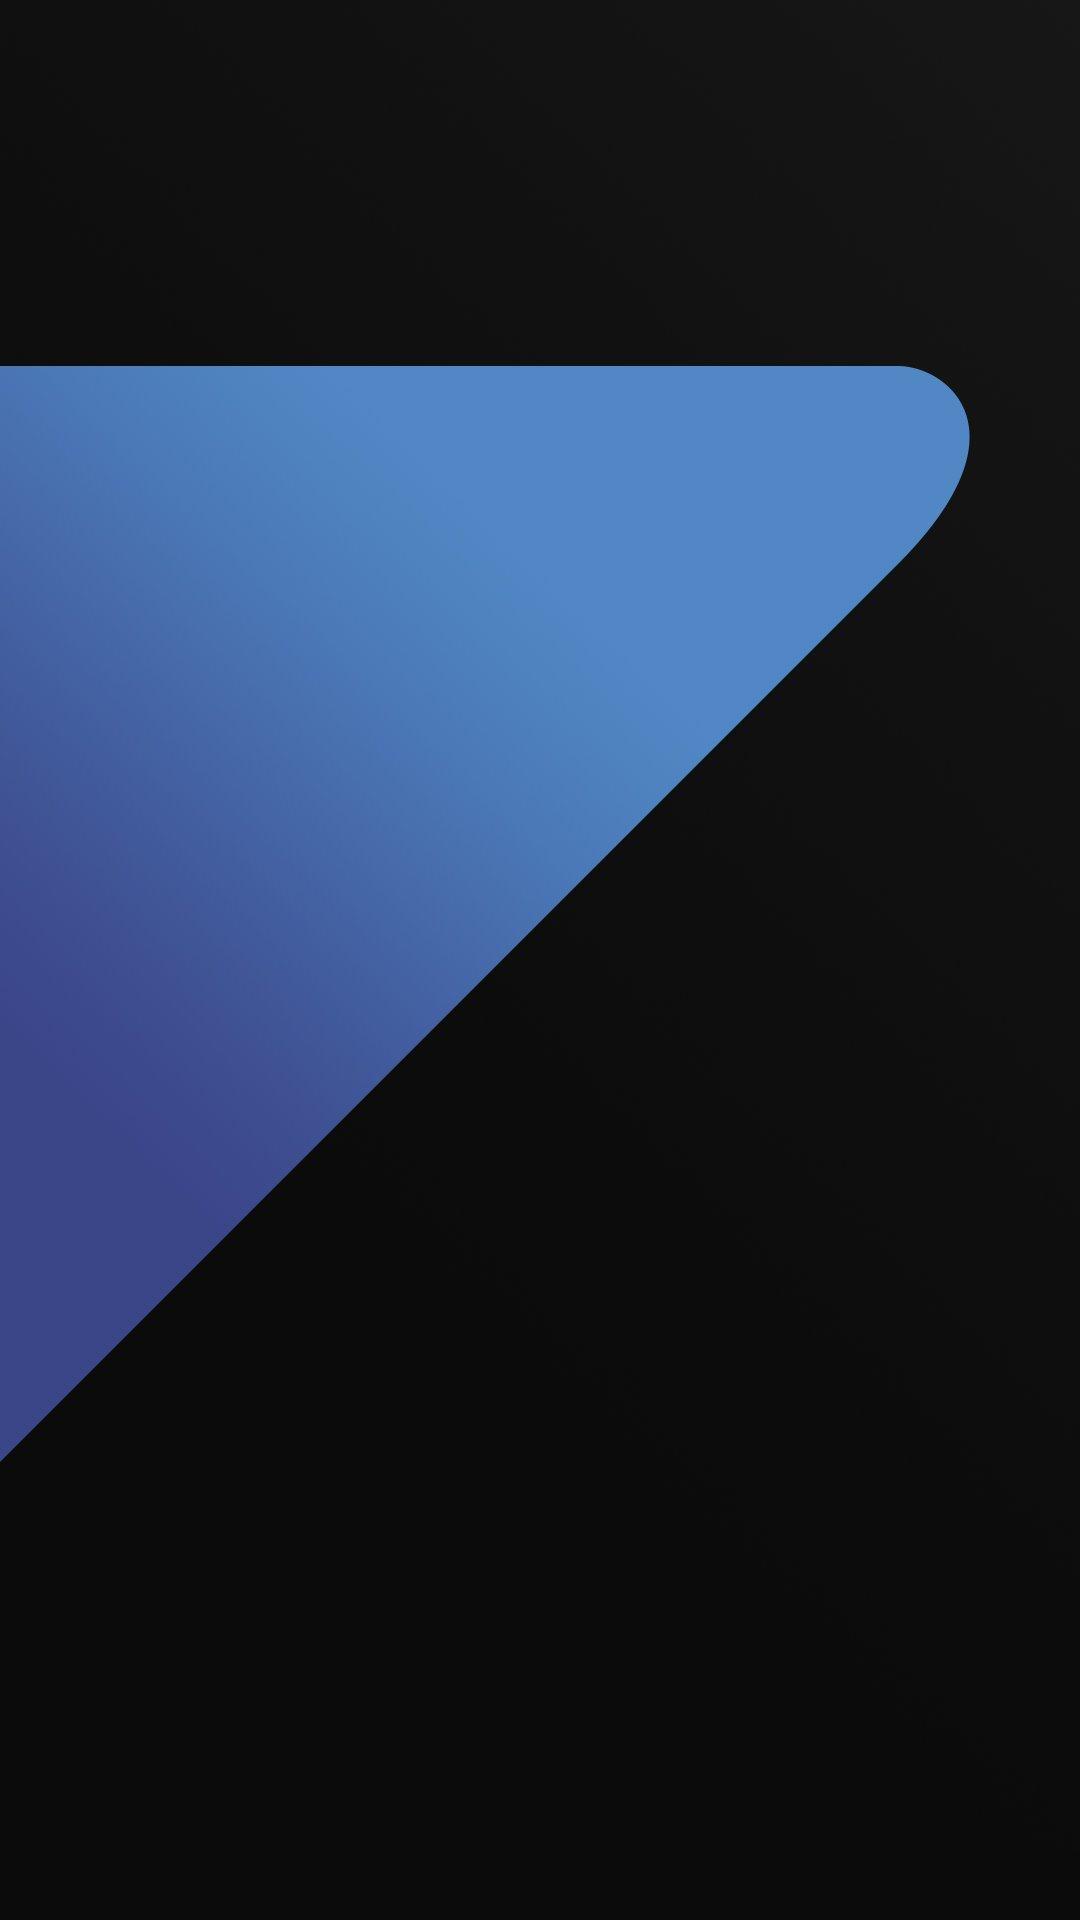 Samsung s6 edge wallpaper size